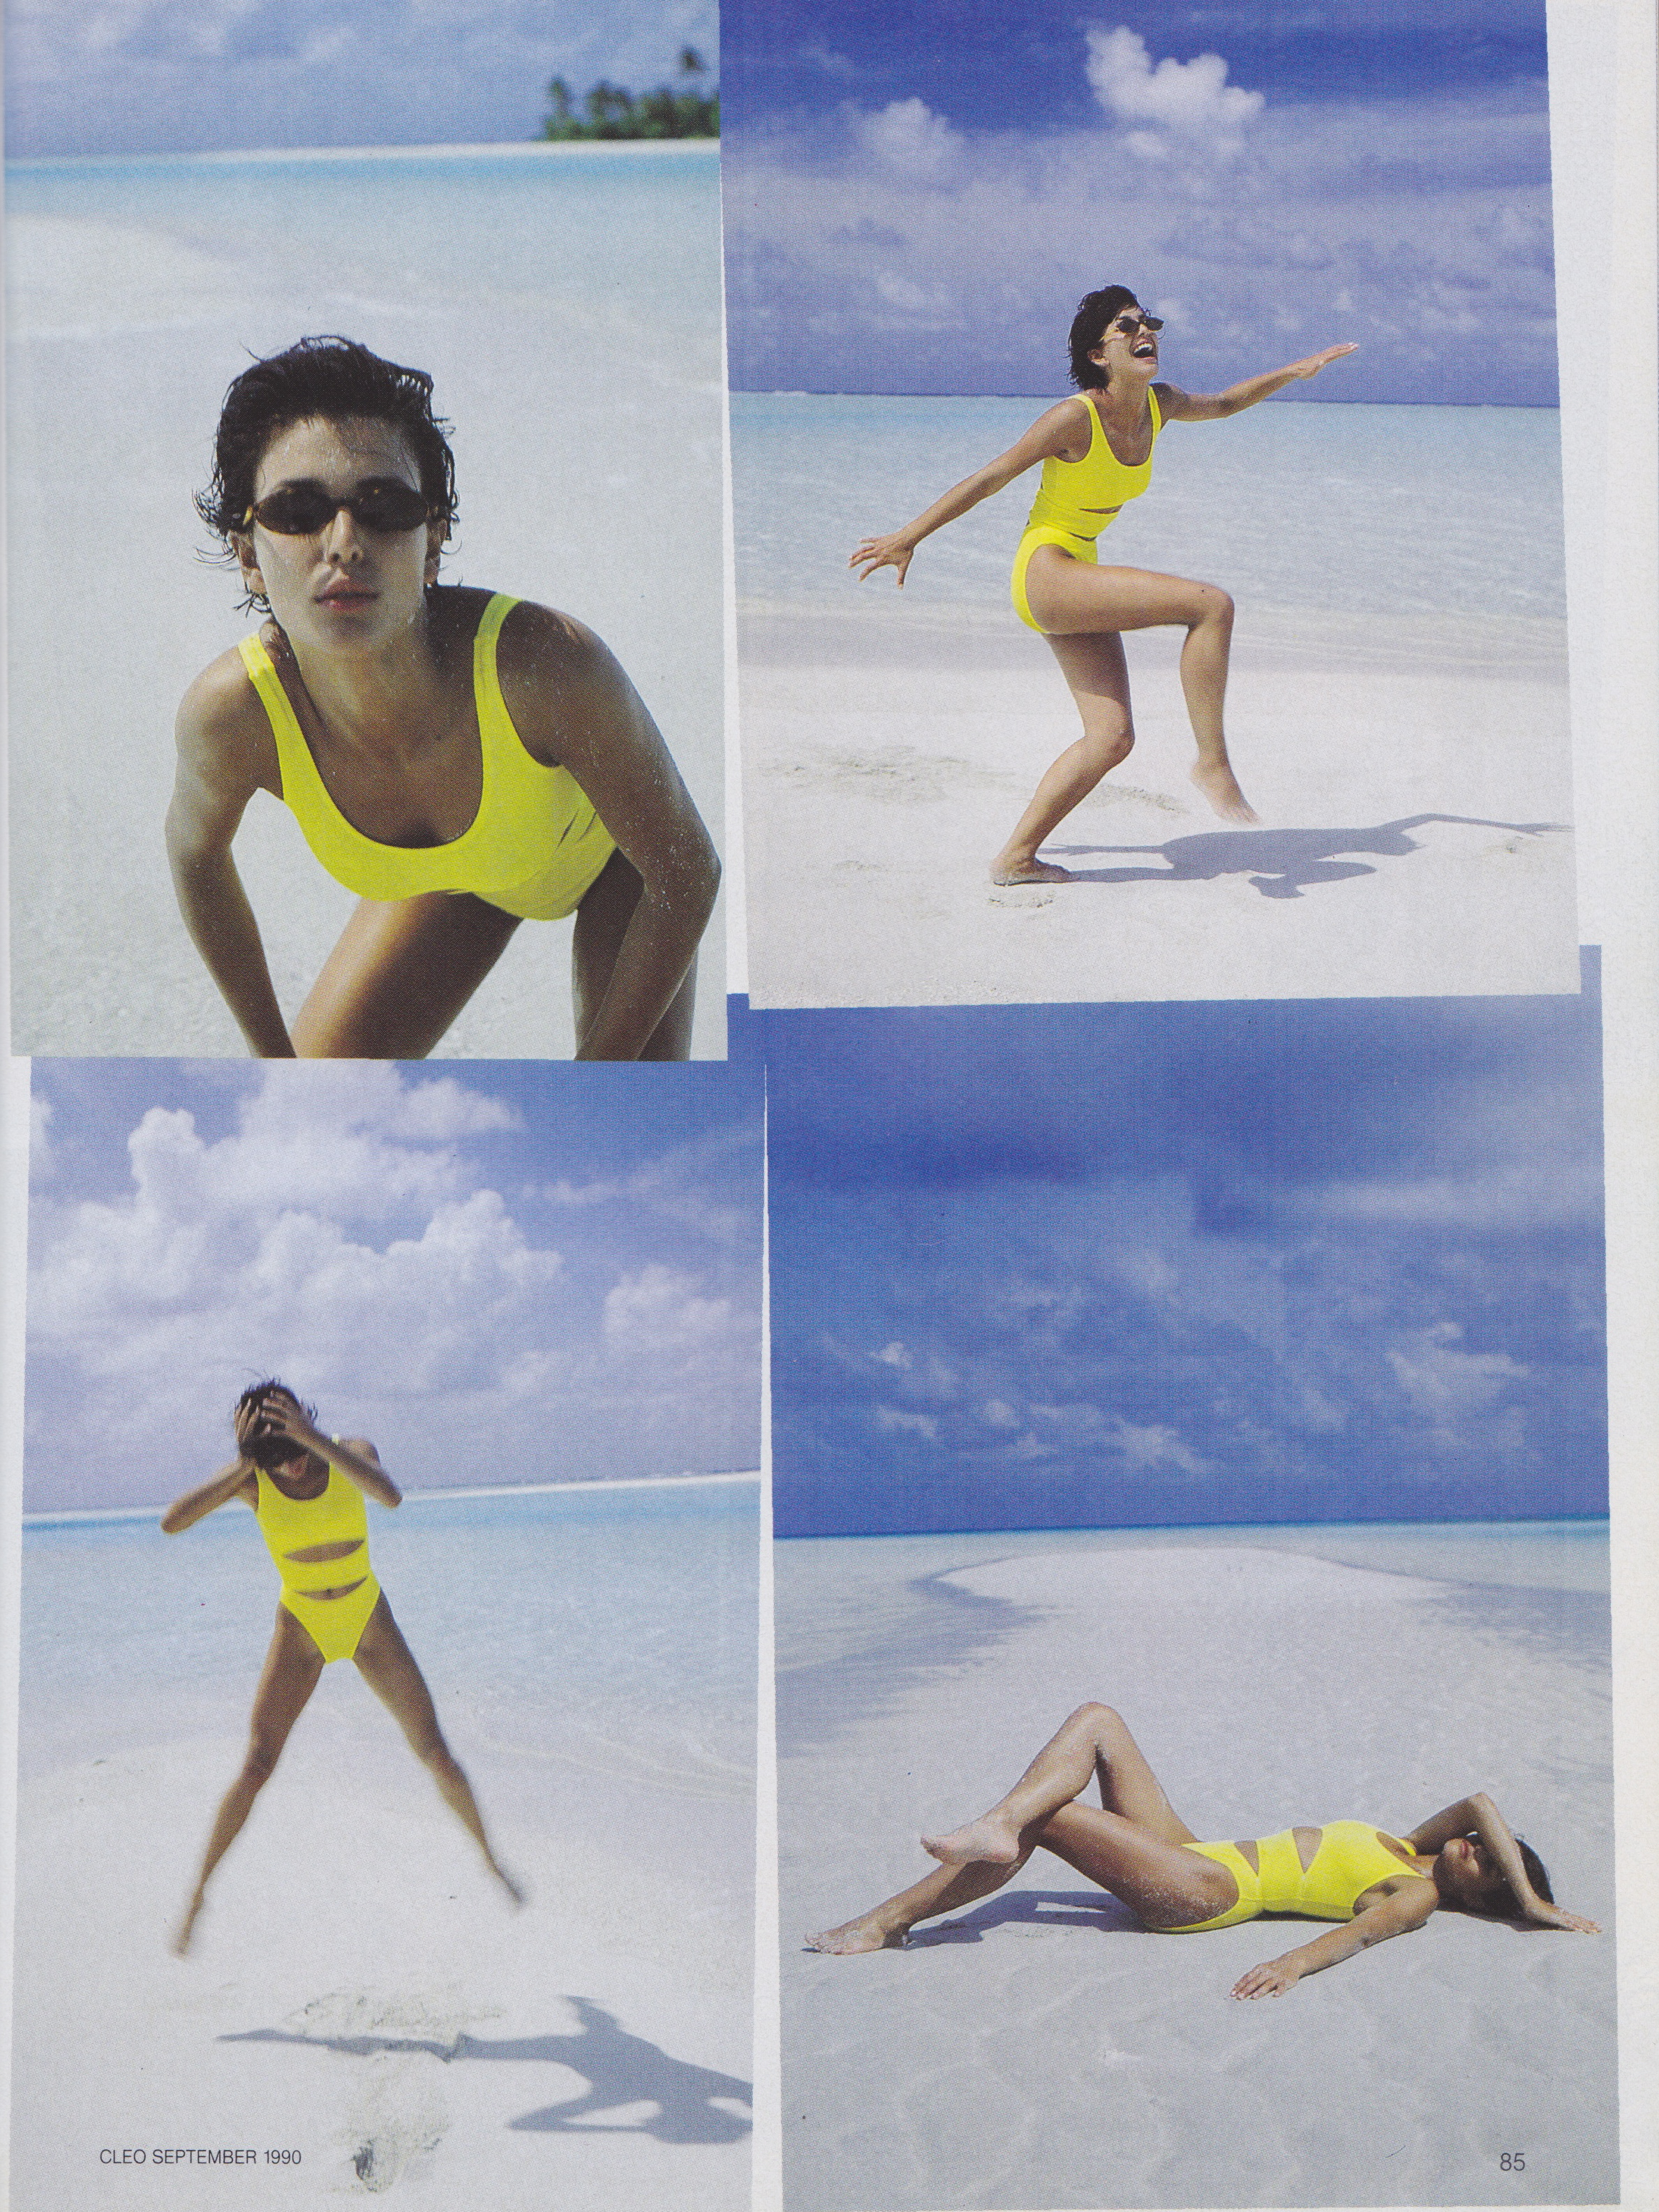 CLEO September 1990 | Tonya Bird 06.jpeg